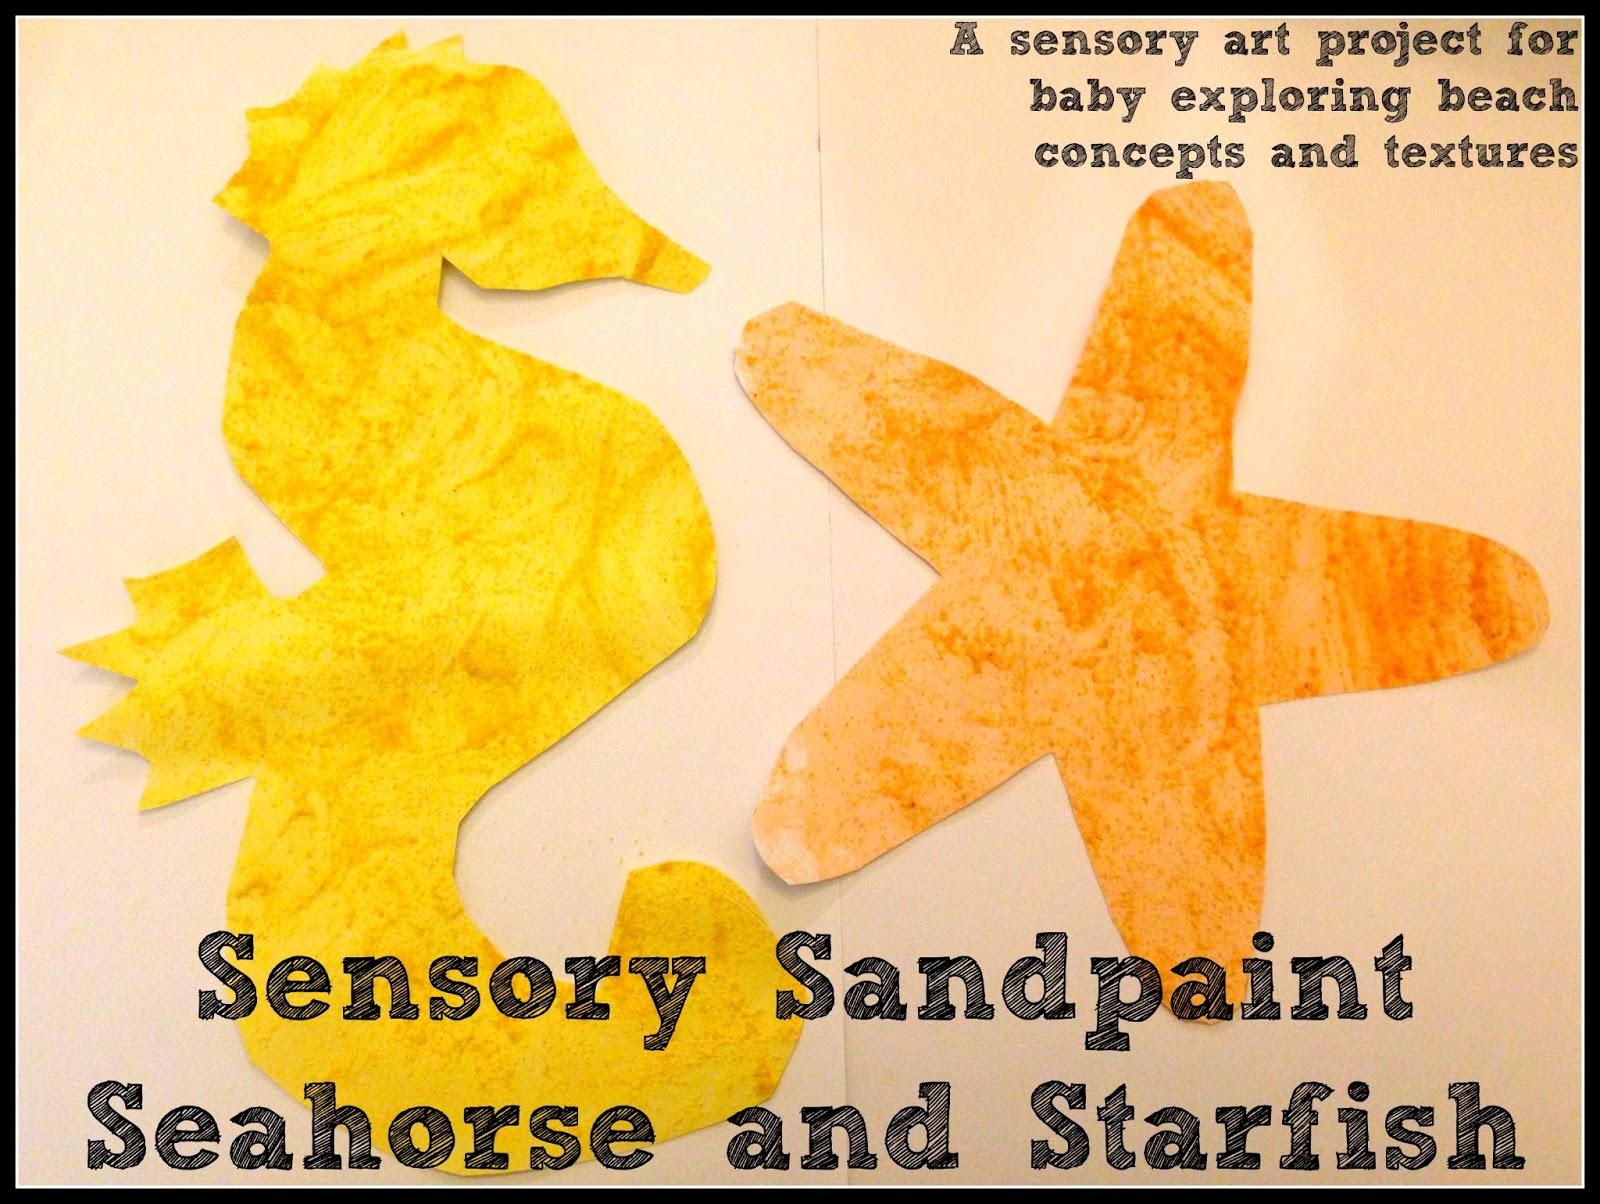 House Of Burke Sensory Sandpaint Seahorse And Starfish